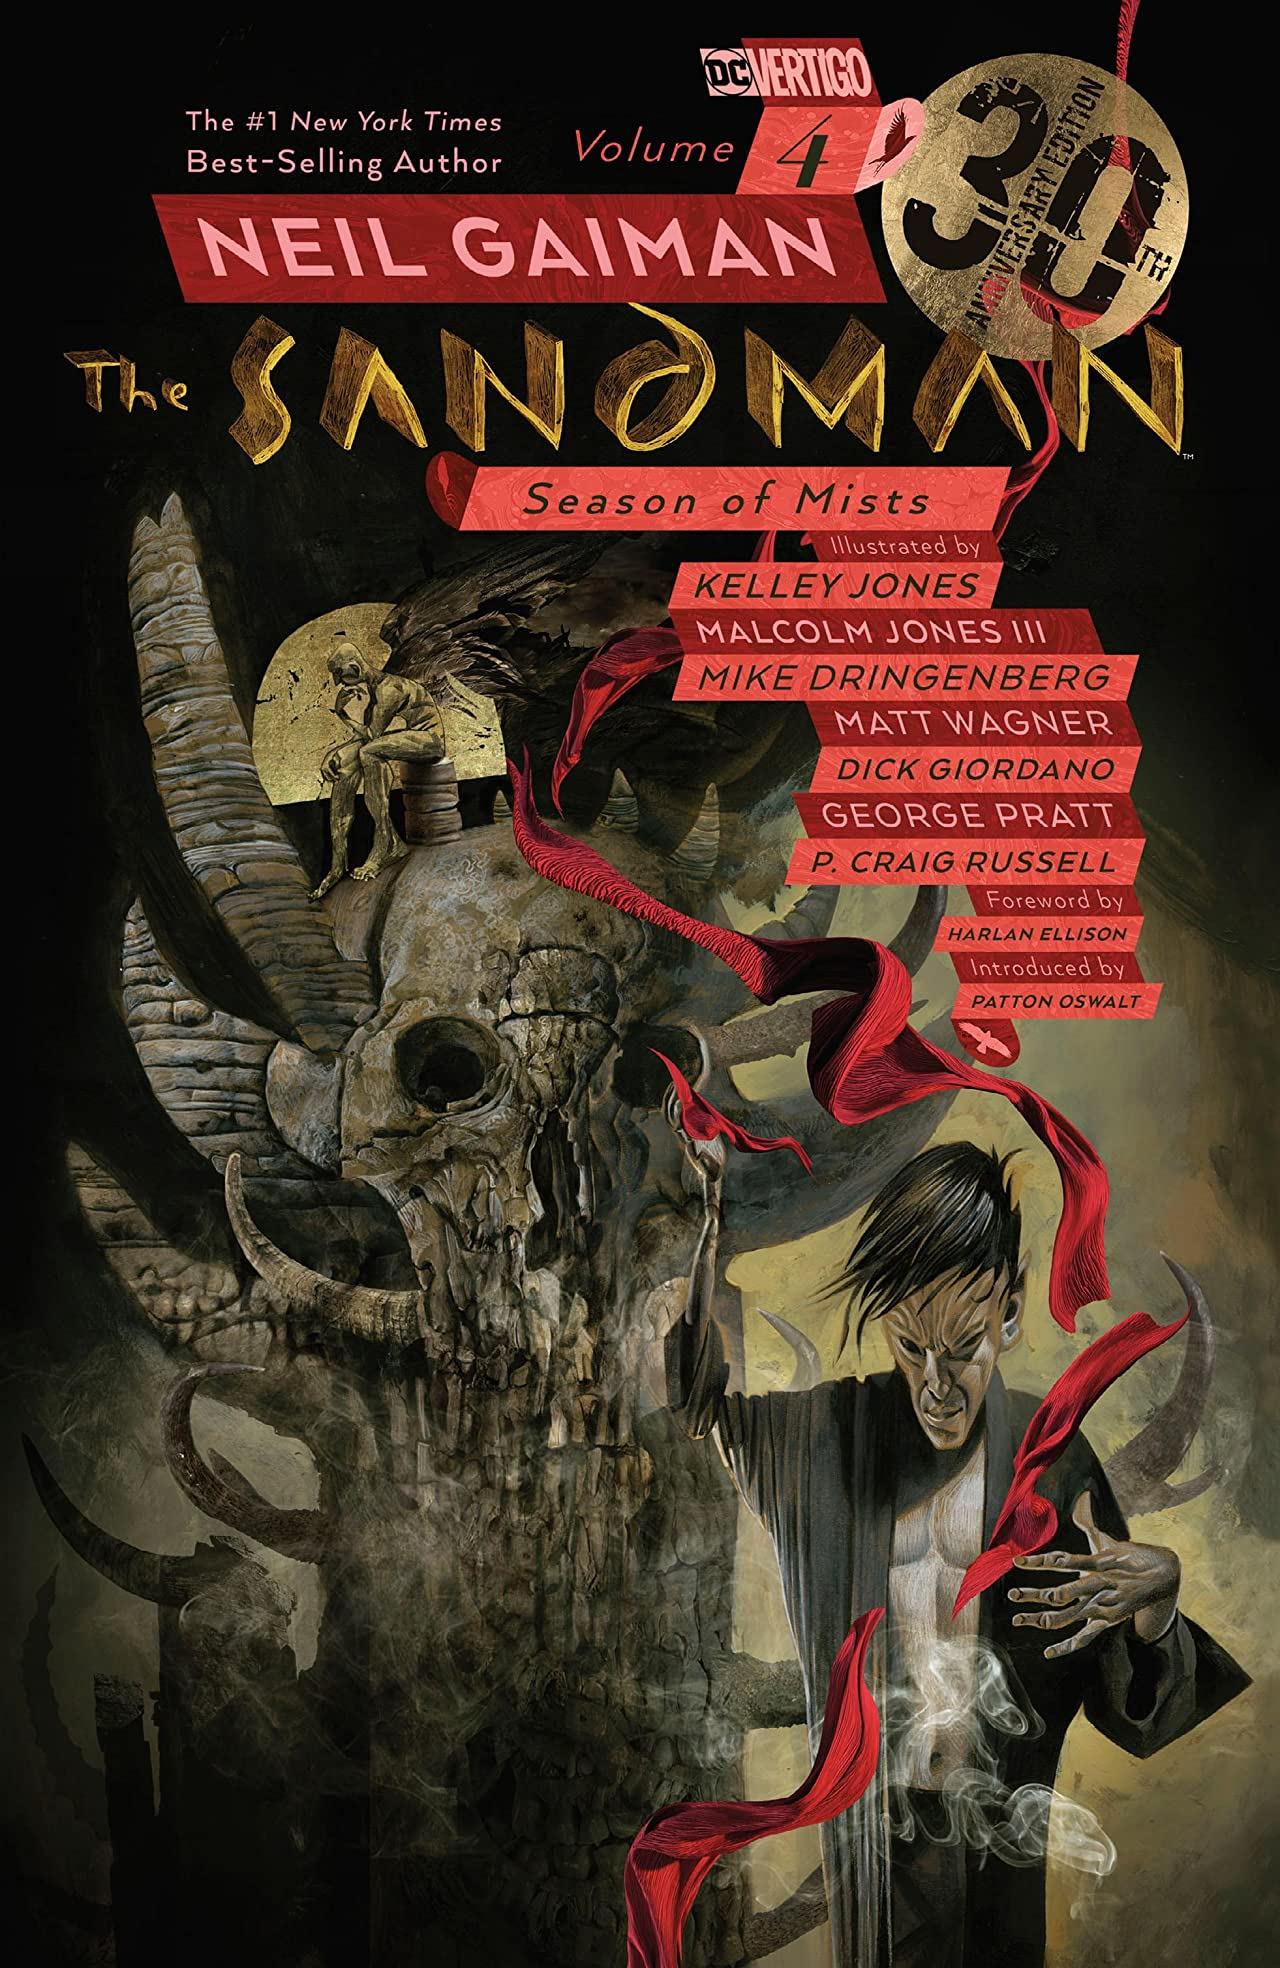 The Sandman, Vol. 4: Season of Mists - 30th Anniversary Edition by Neil Gaiman